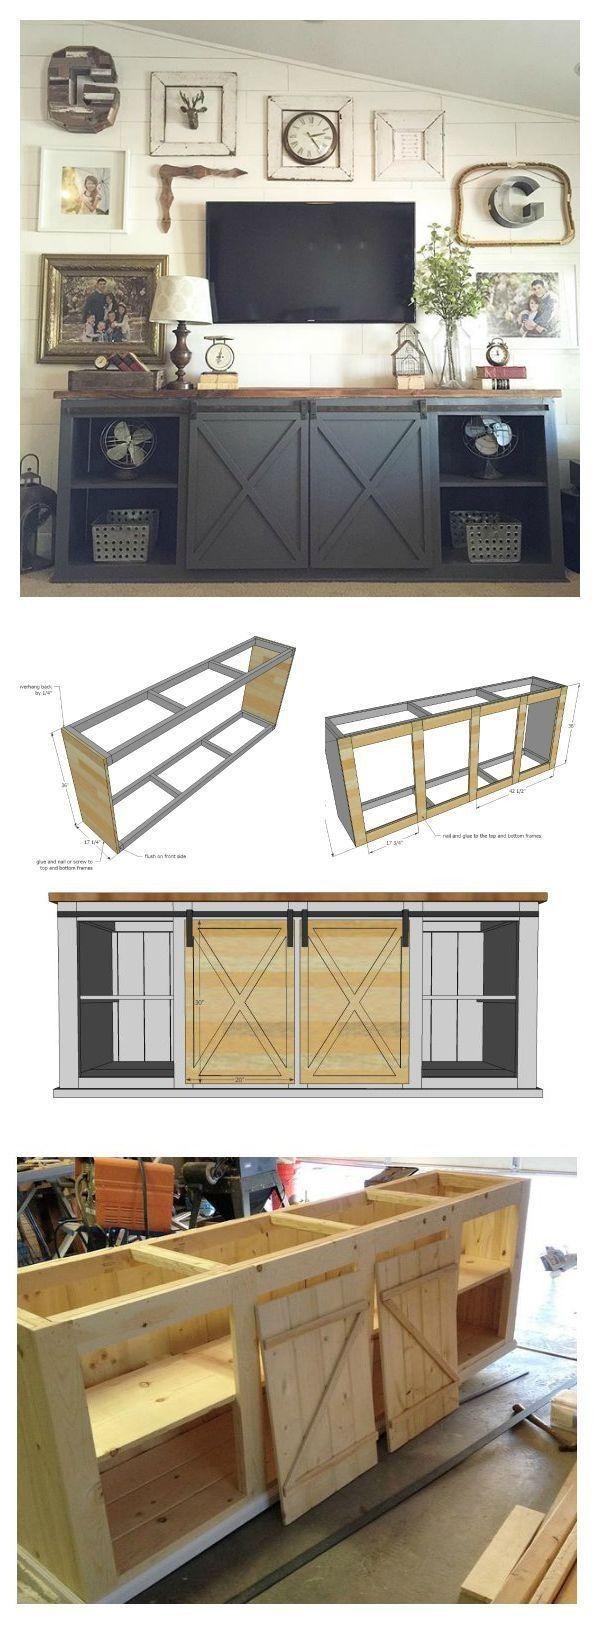 Barndoor cabinet idea.